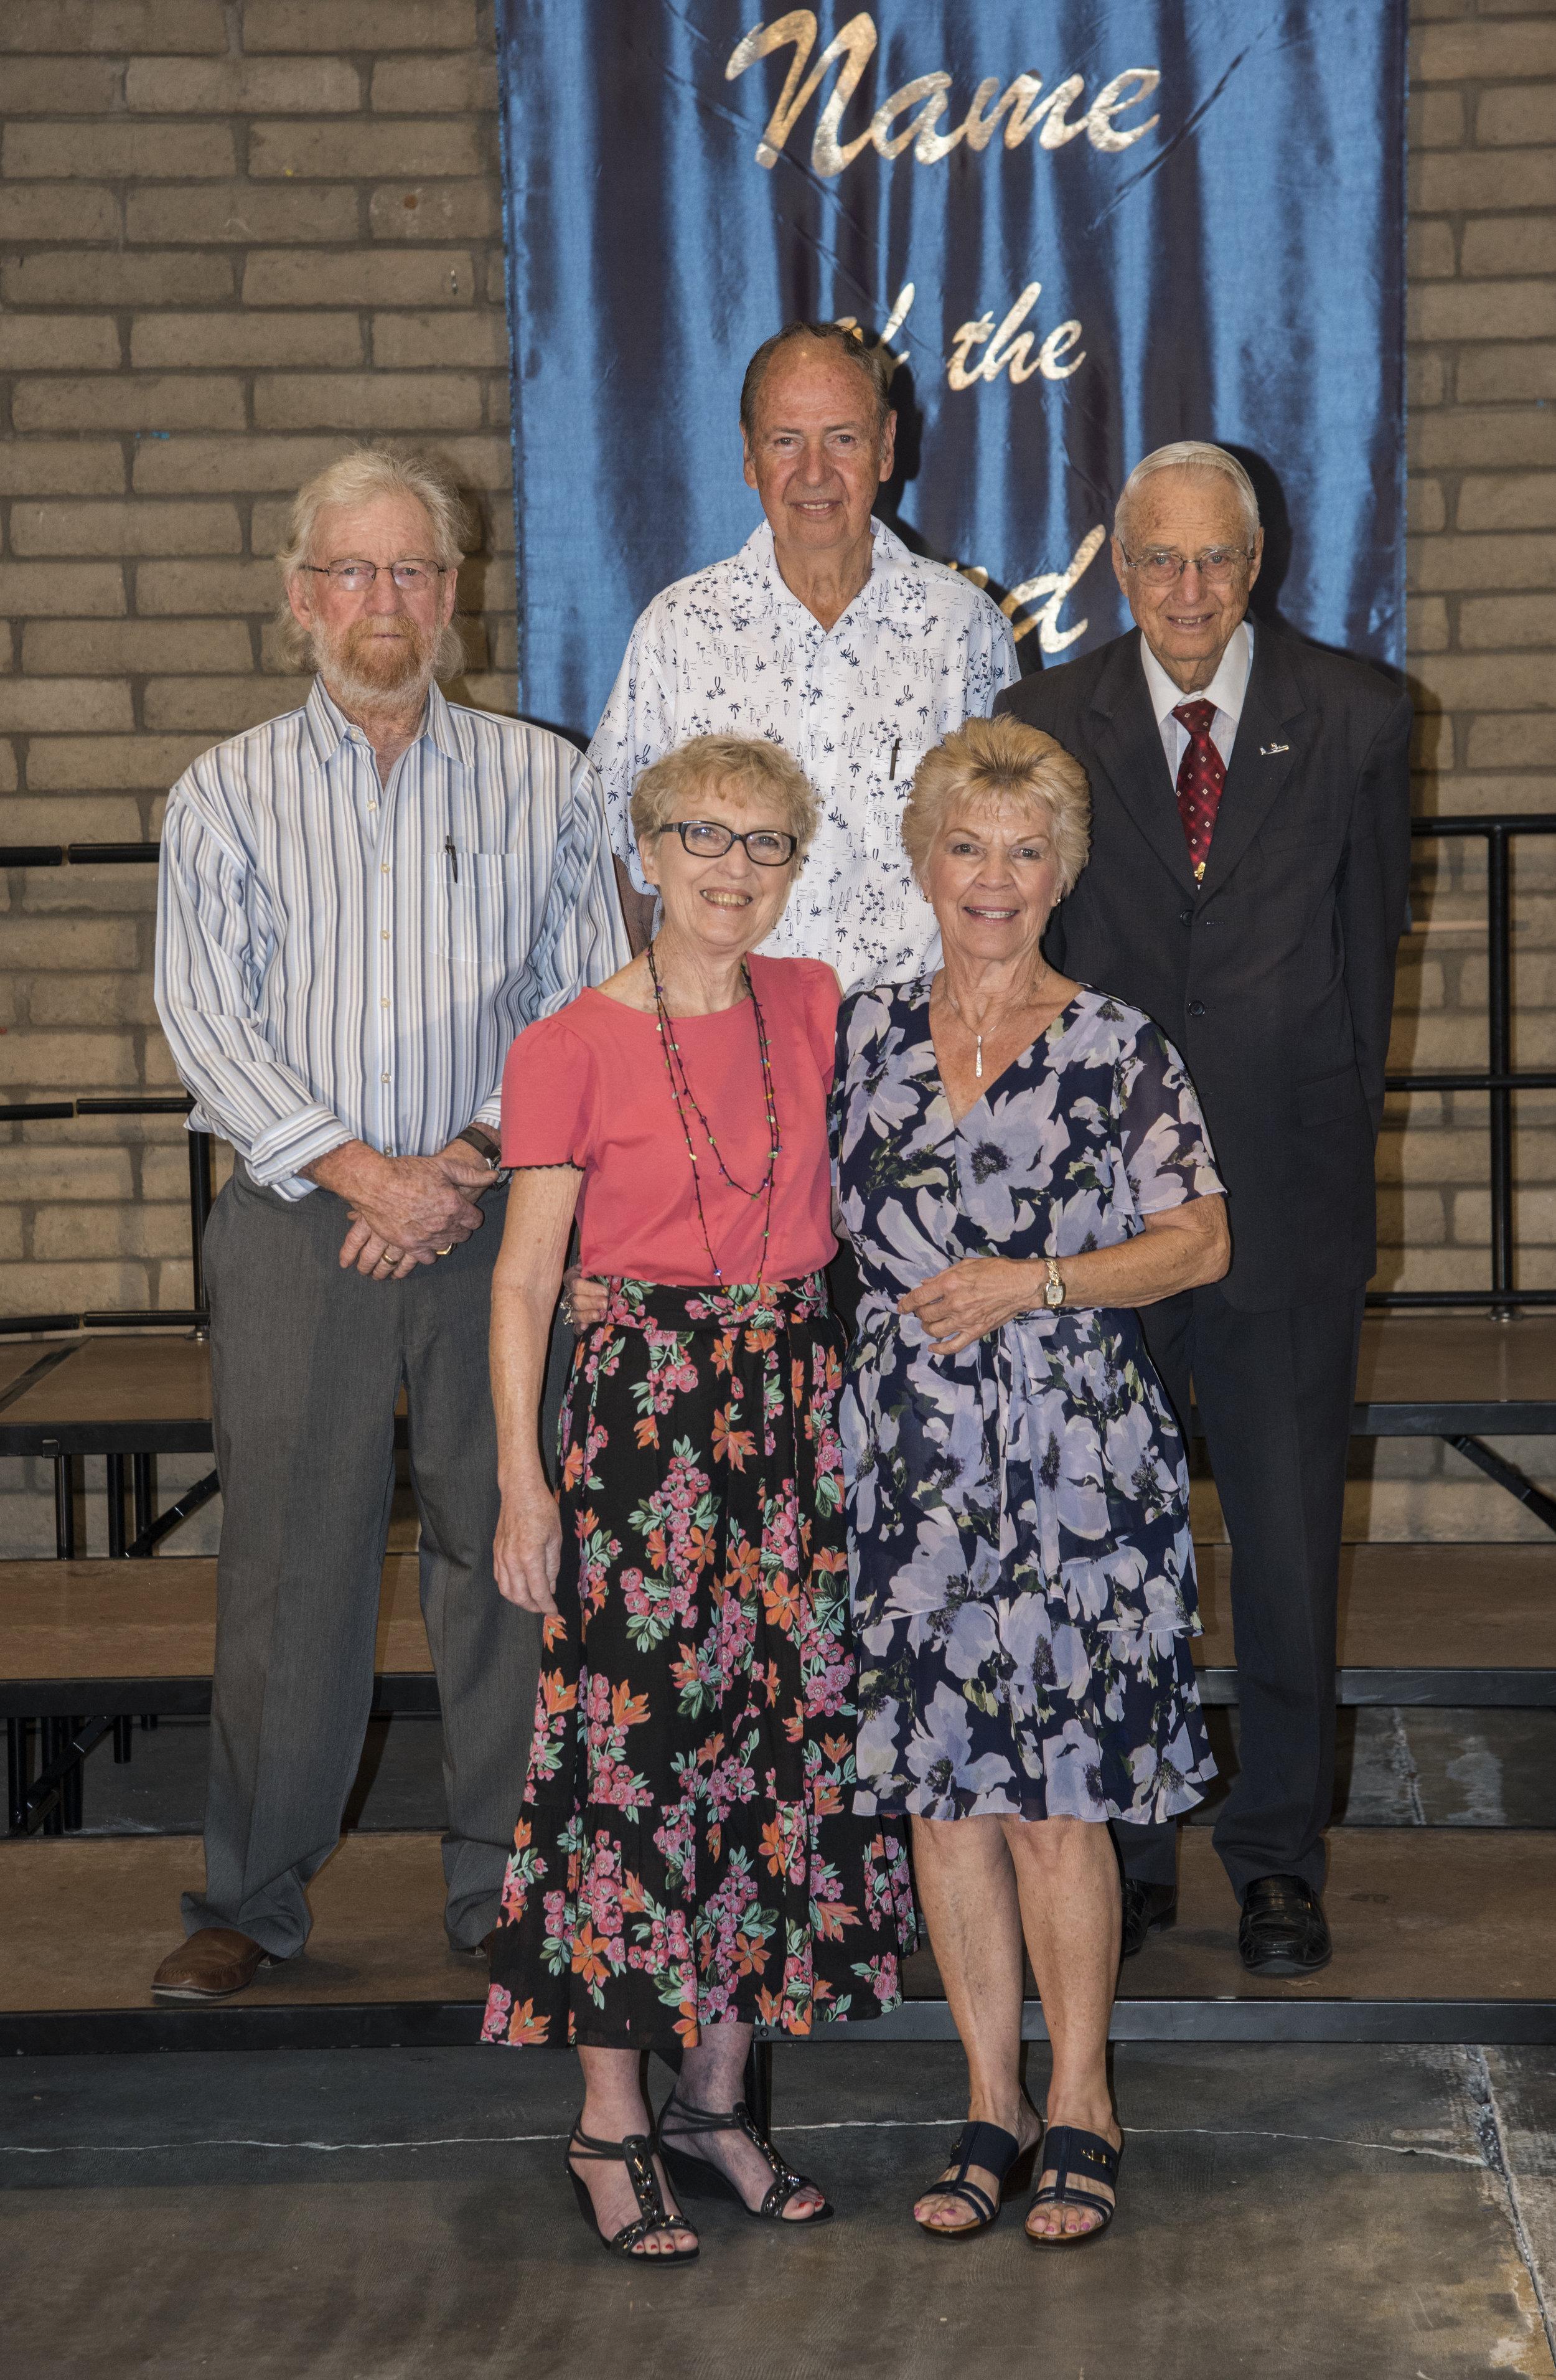 Class of 1959 - Front Row: Patty Yingling Muncy & Eunice Hummell ZuFeltBack Row: Bill Jordan, David Reidlinger & W. Daniel Walter